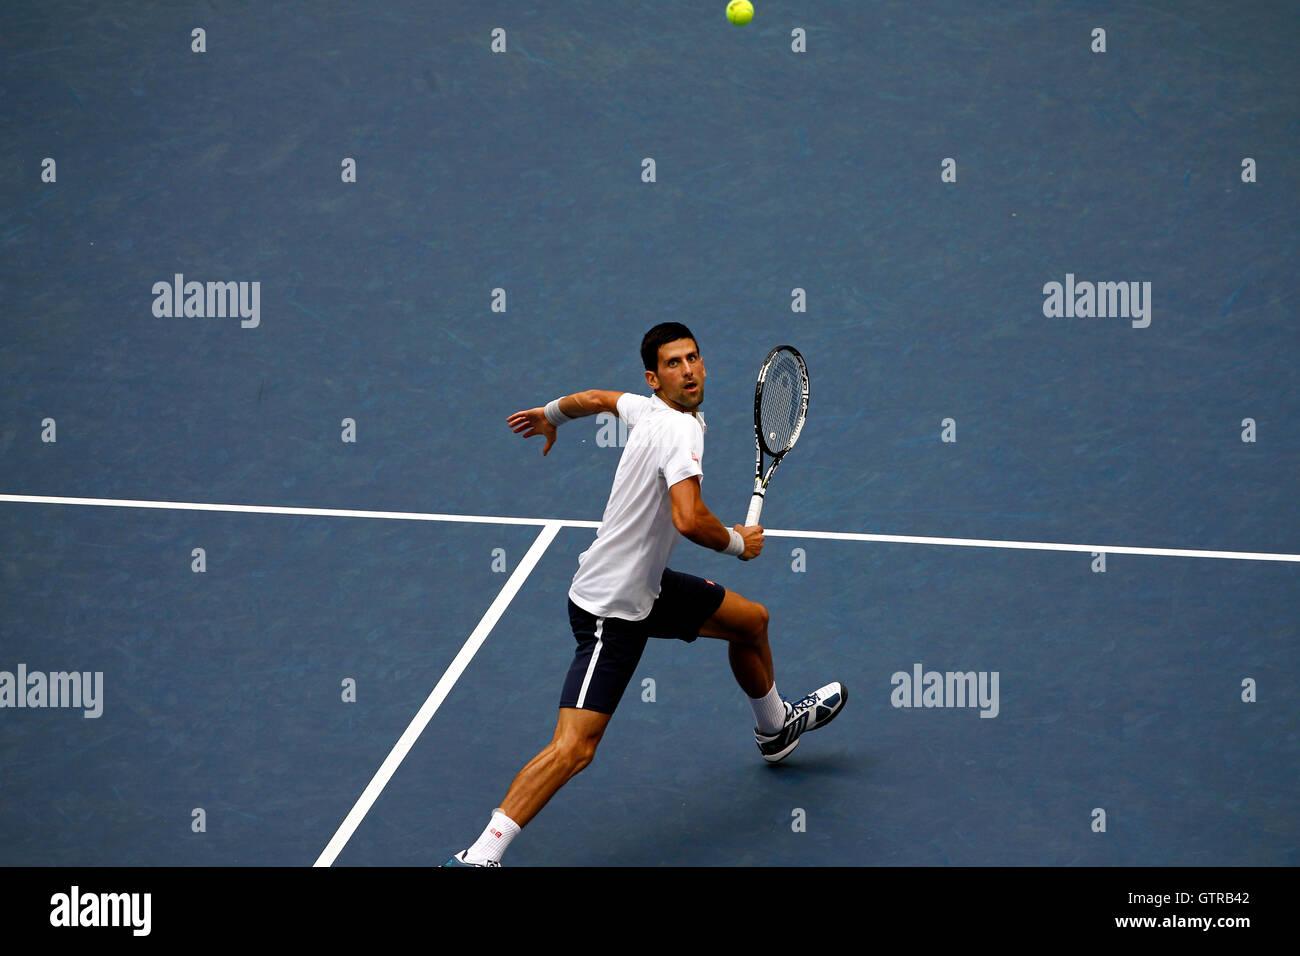 New York, United States. 09th Sep, 2016. Novak Djokovic tracks a lob during his semi final match against Gael Monfils - Stock Image